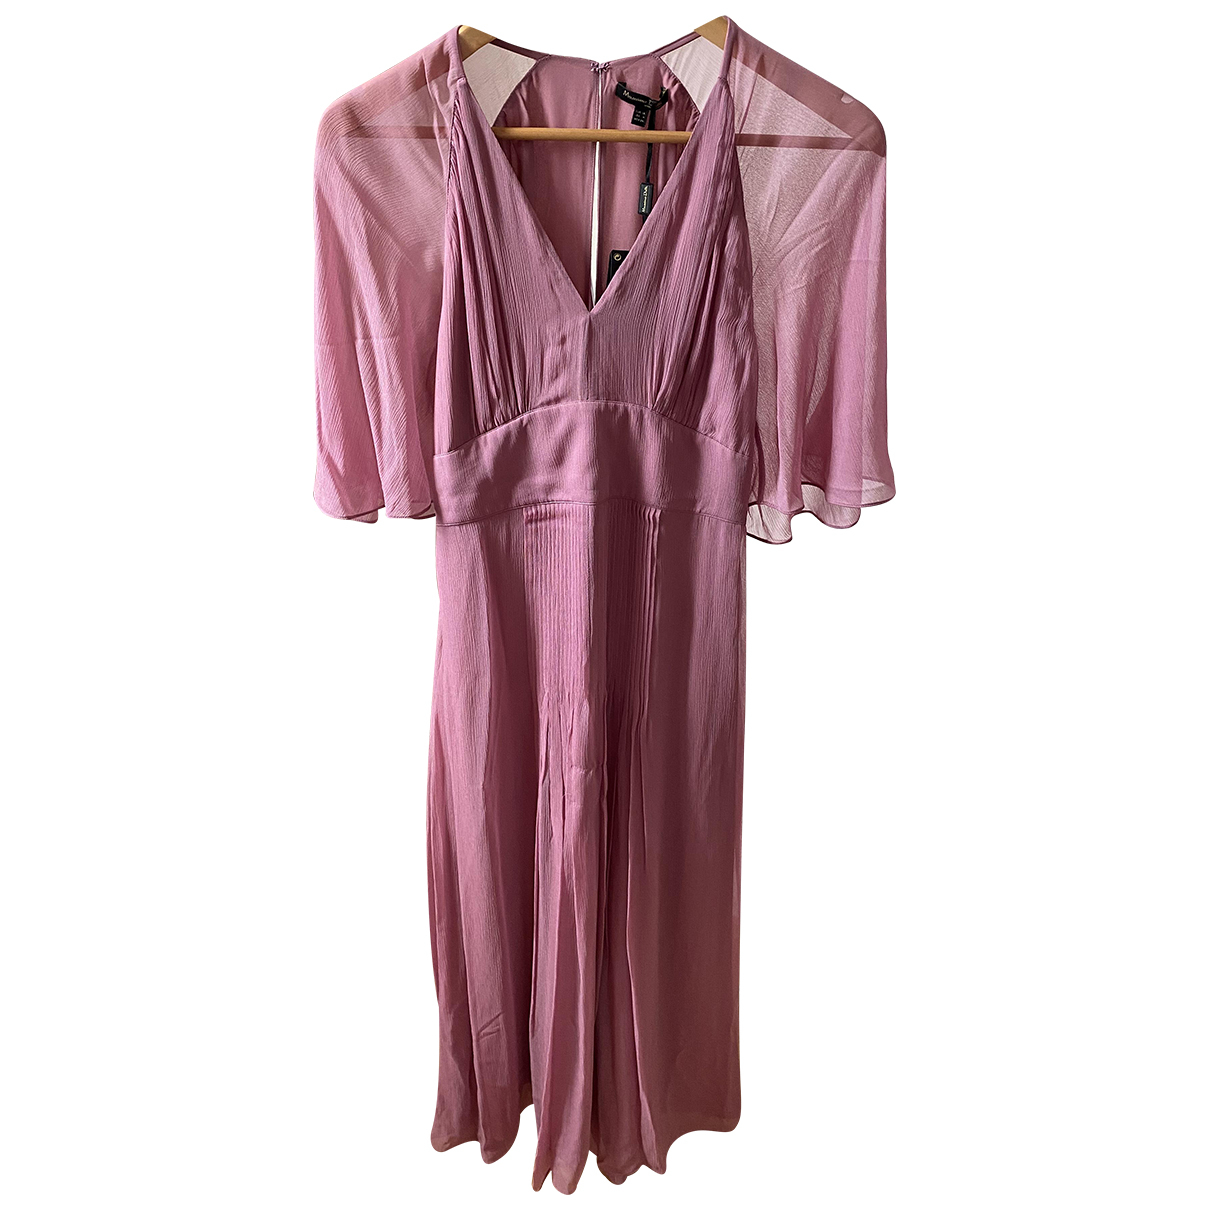 Massimo Dutti \N Kleid in  Lila Viskose